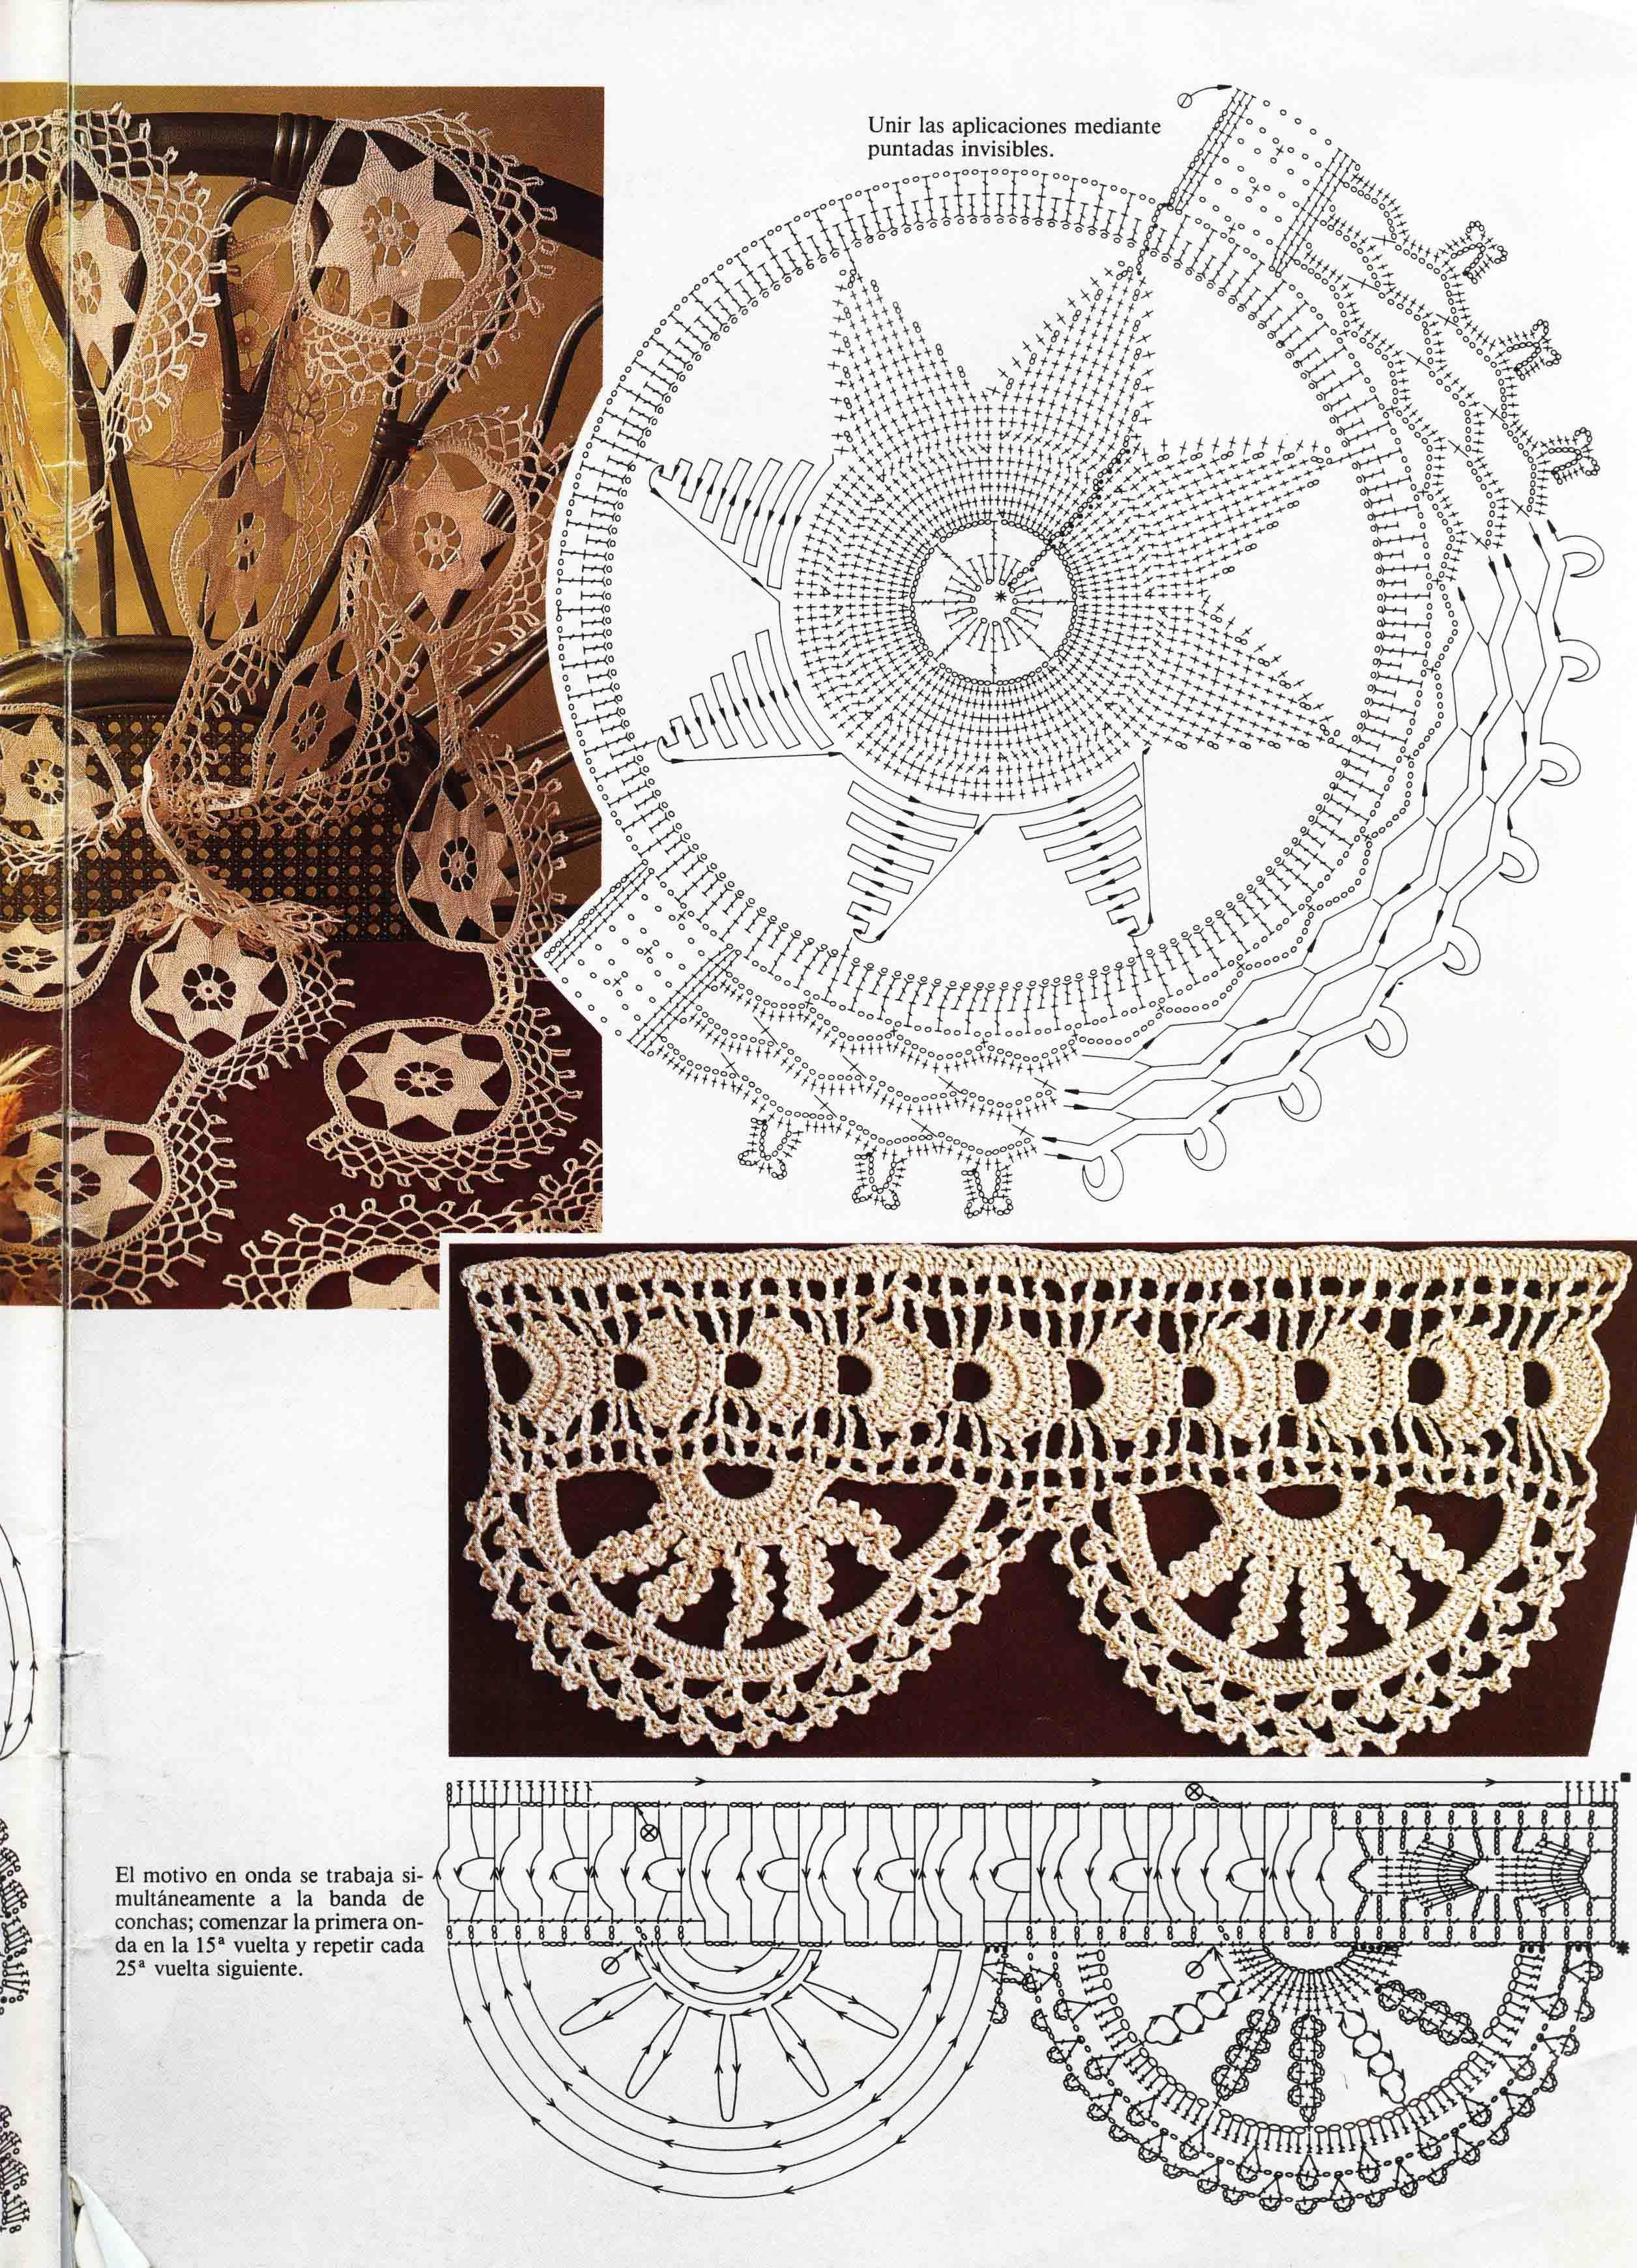 Pin de Maria Jose en crochet puntilla rectas | Pinterest | Croché ...